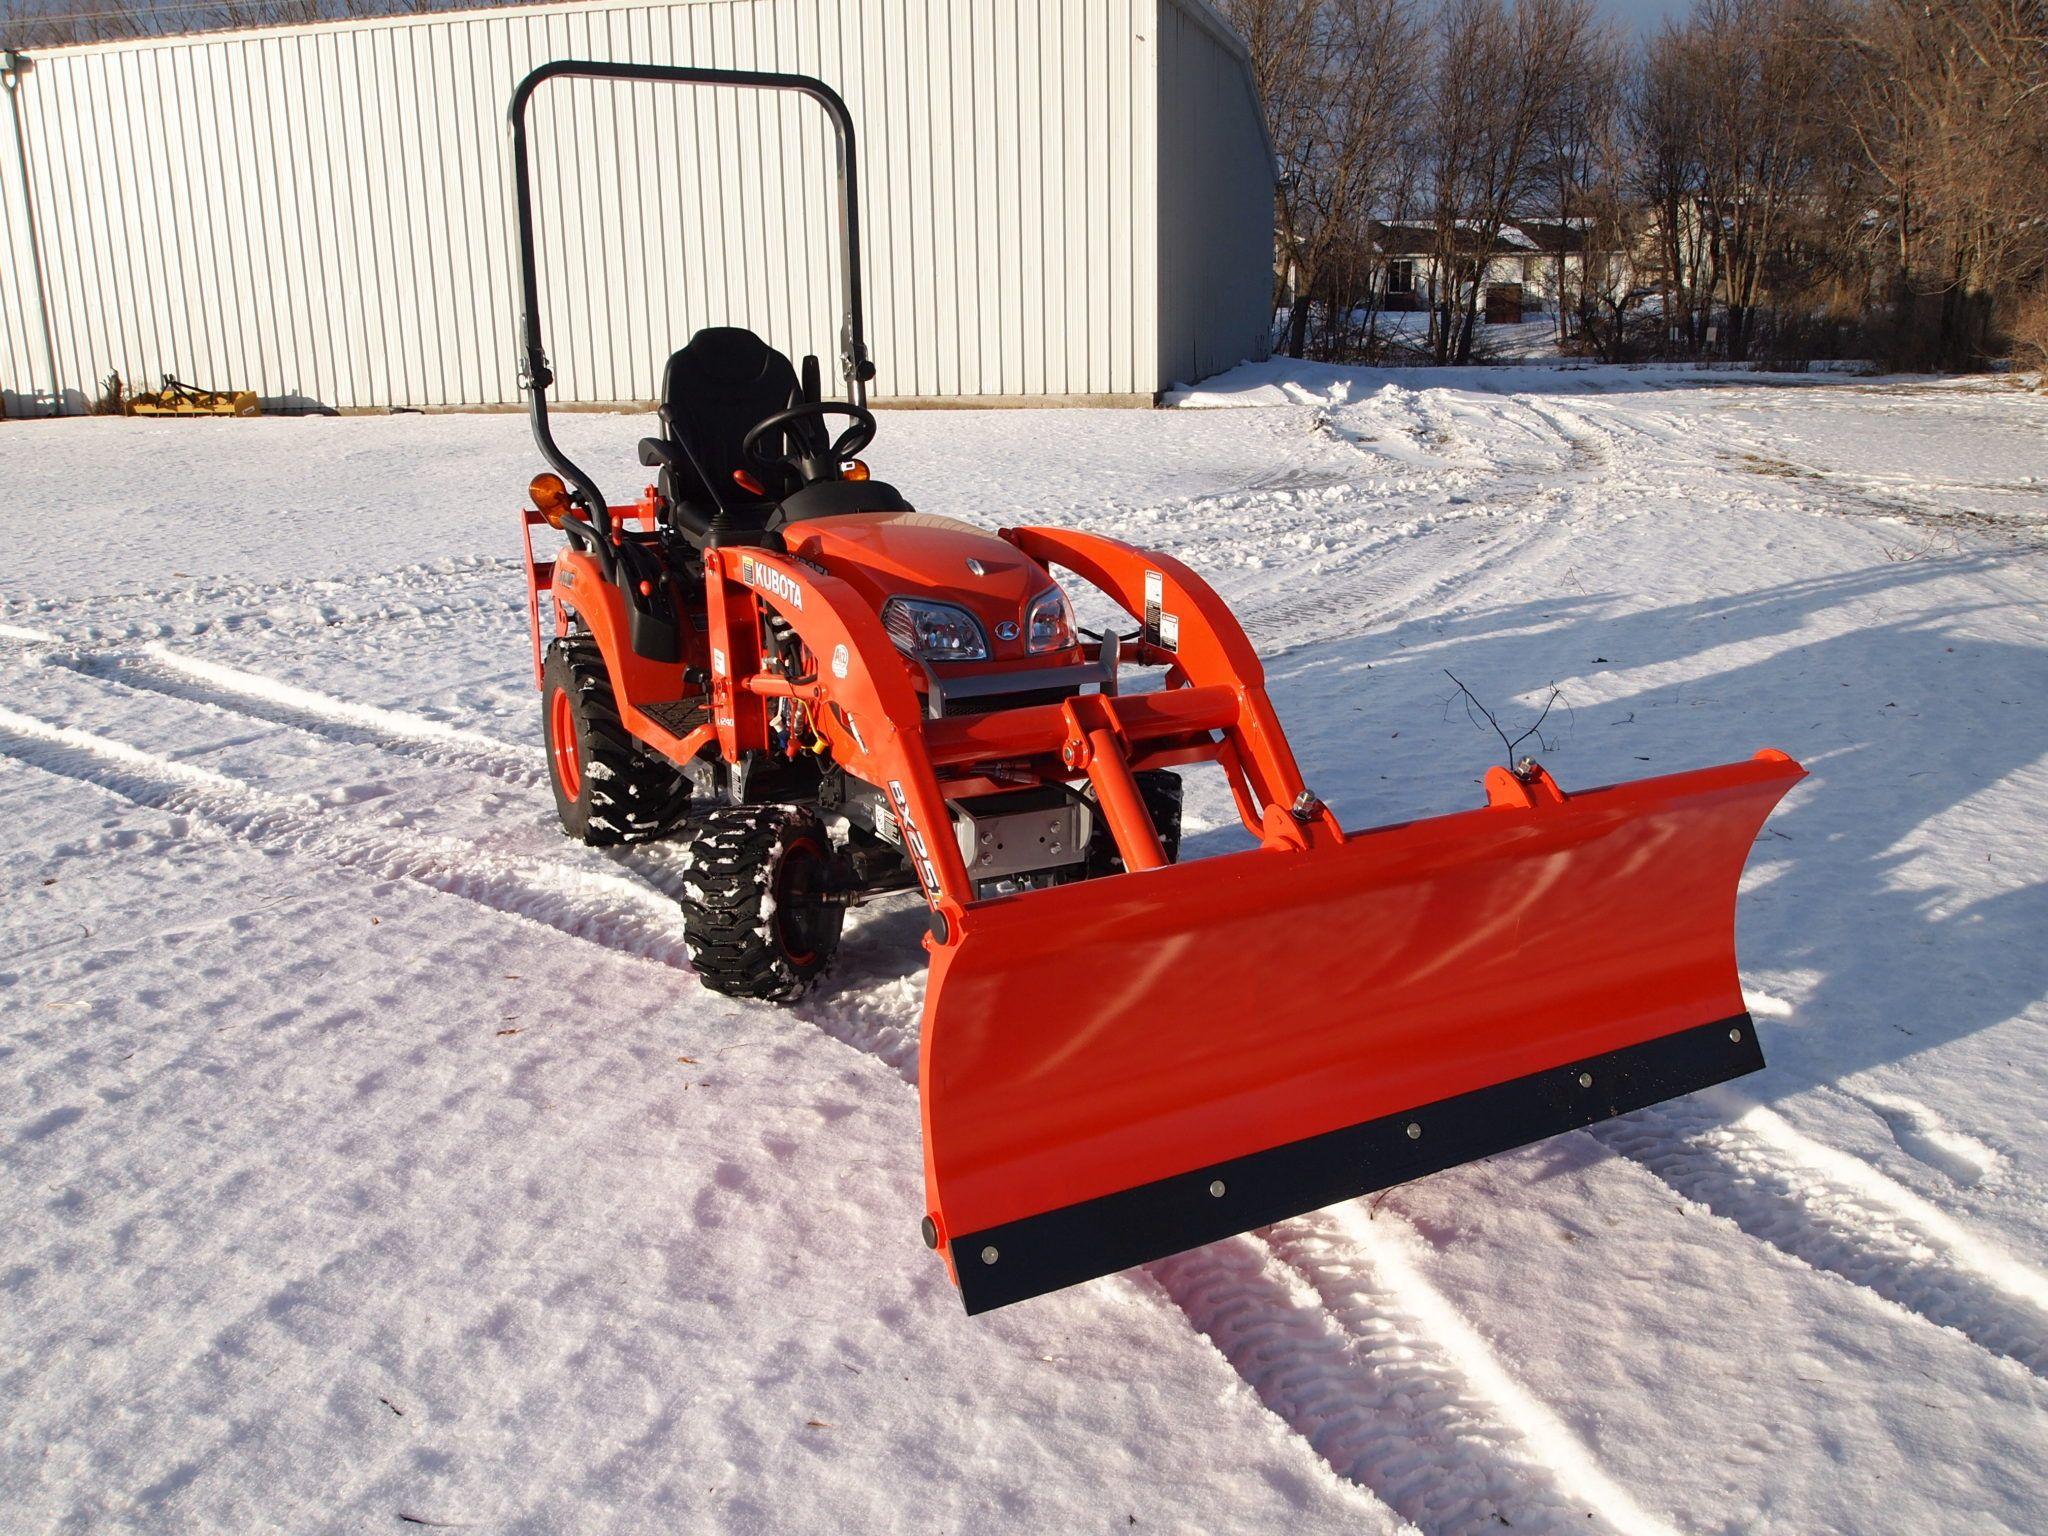 Tractor Bucket Attachments : Kubota bx rock bucket attachment snow plow